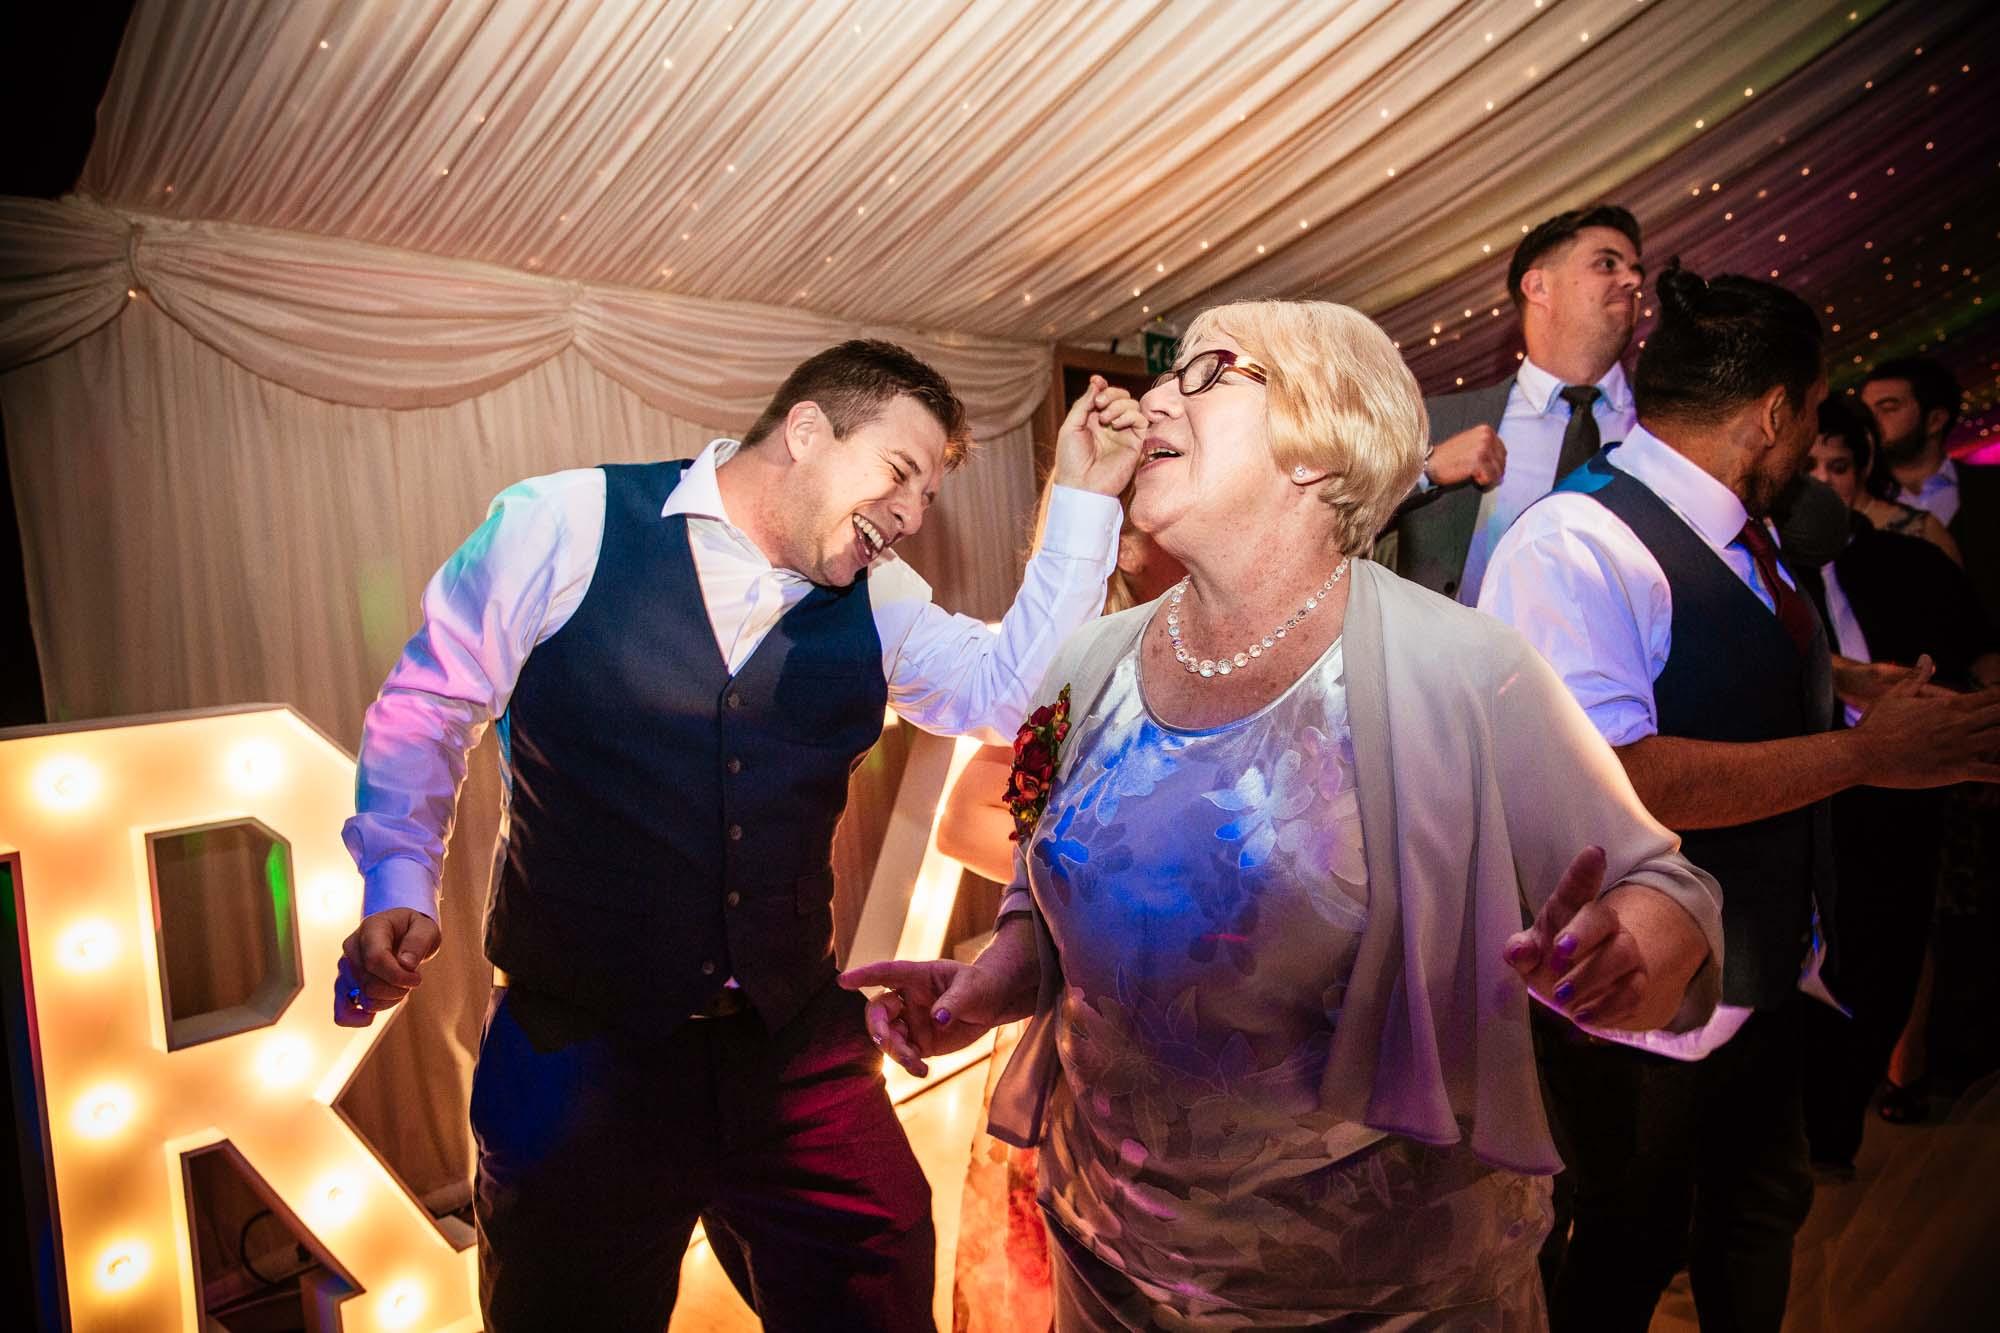 Wedding Receptions Heaton House Macclesfield